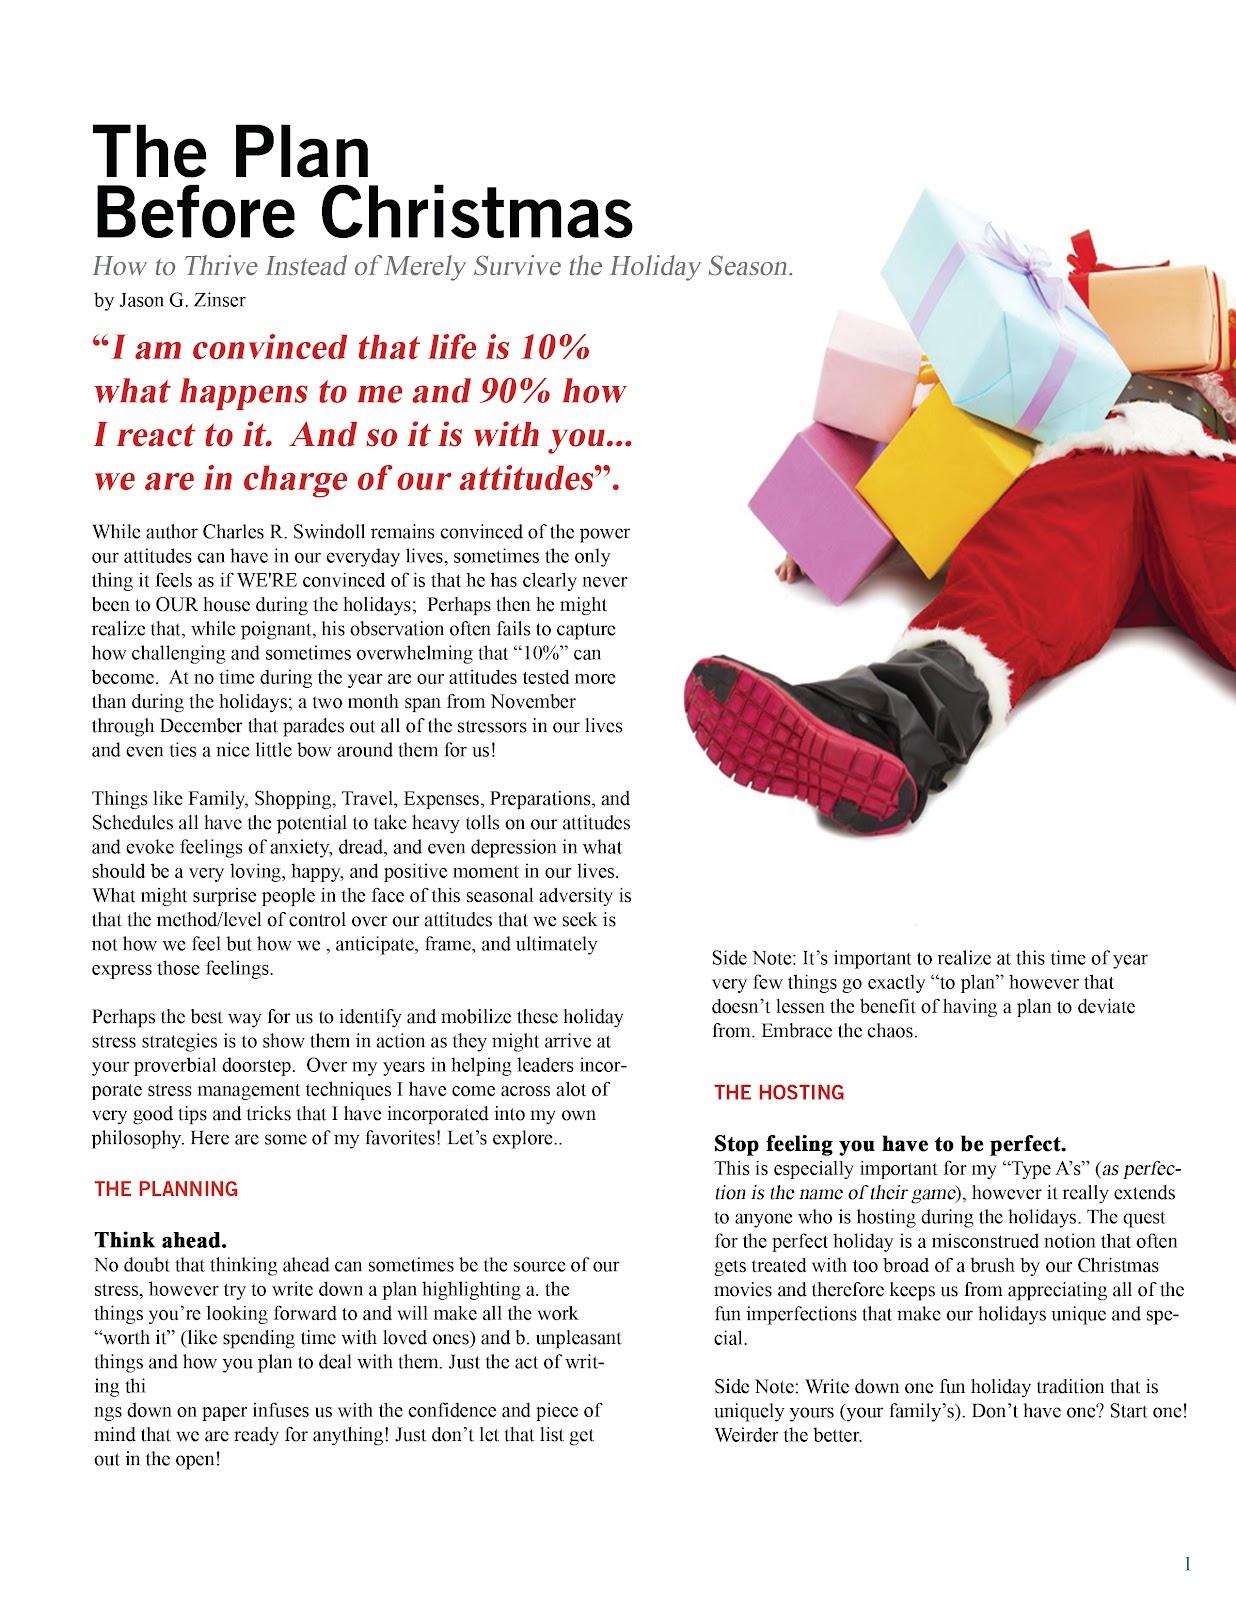 Plan Before Christmas page1.jpg